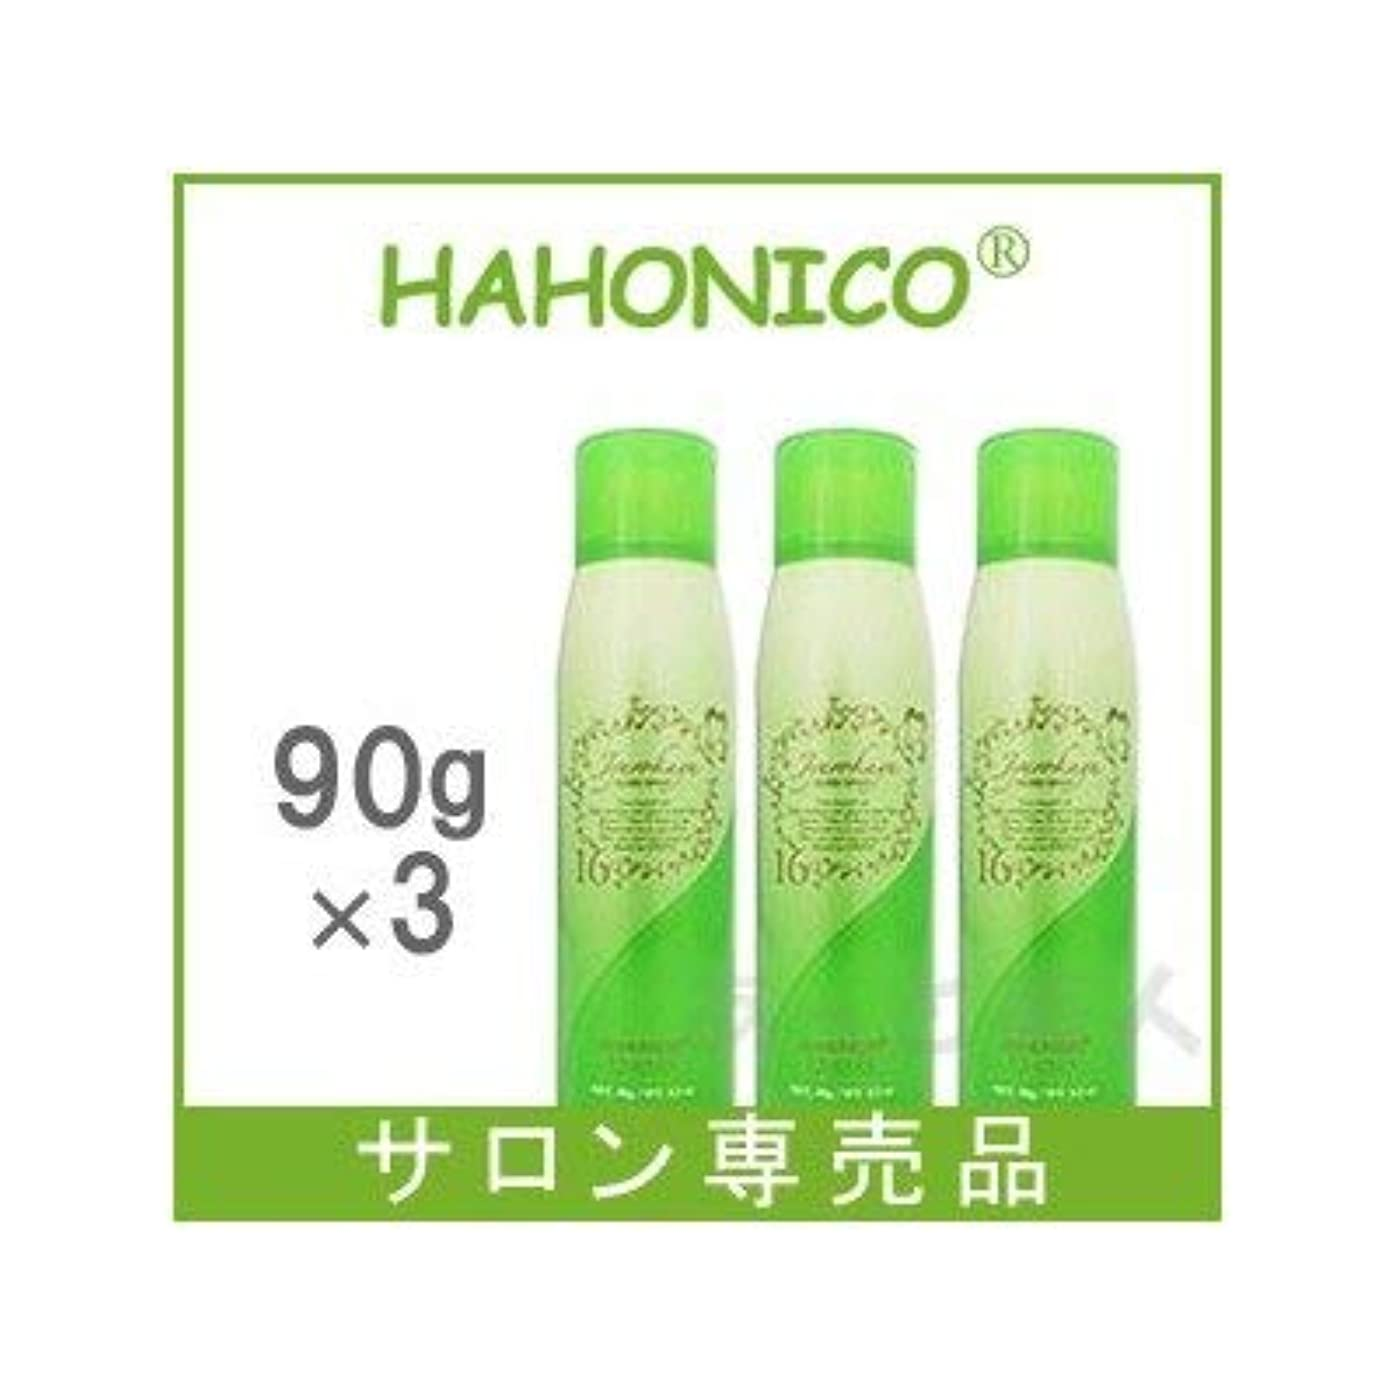 【X3個セット】 ハホニコ ジュウロクユ ツヤスプレー 90g 十六油 HAHONICO